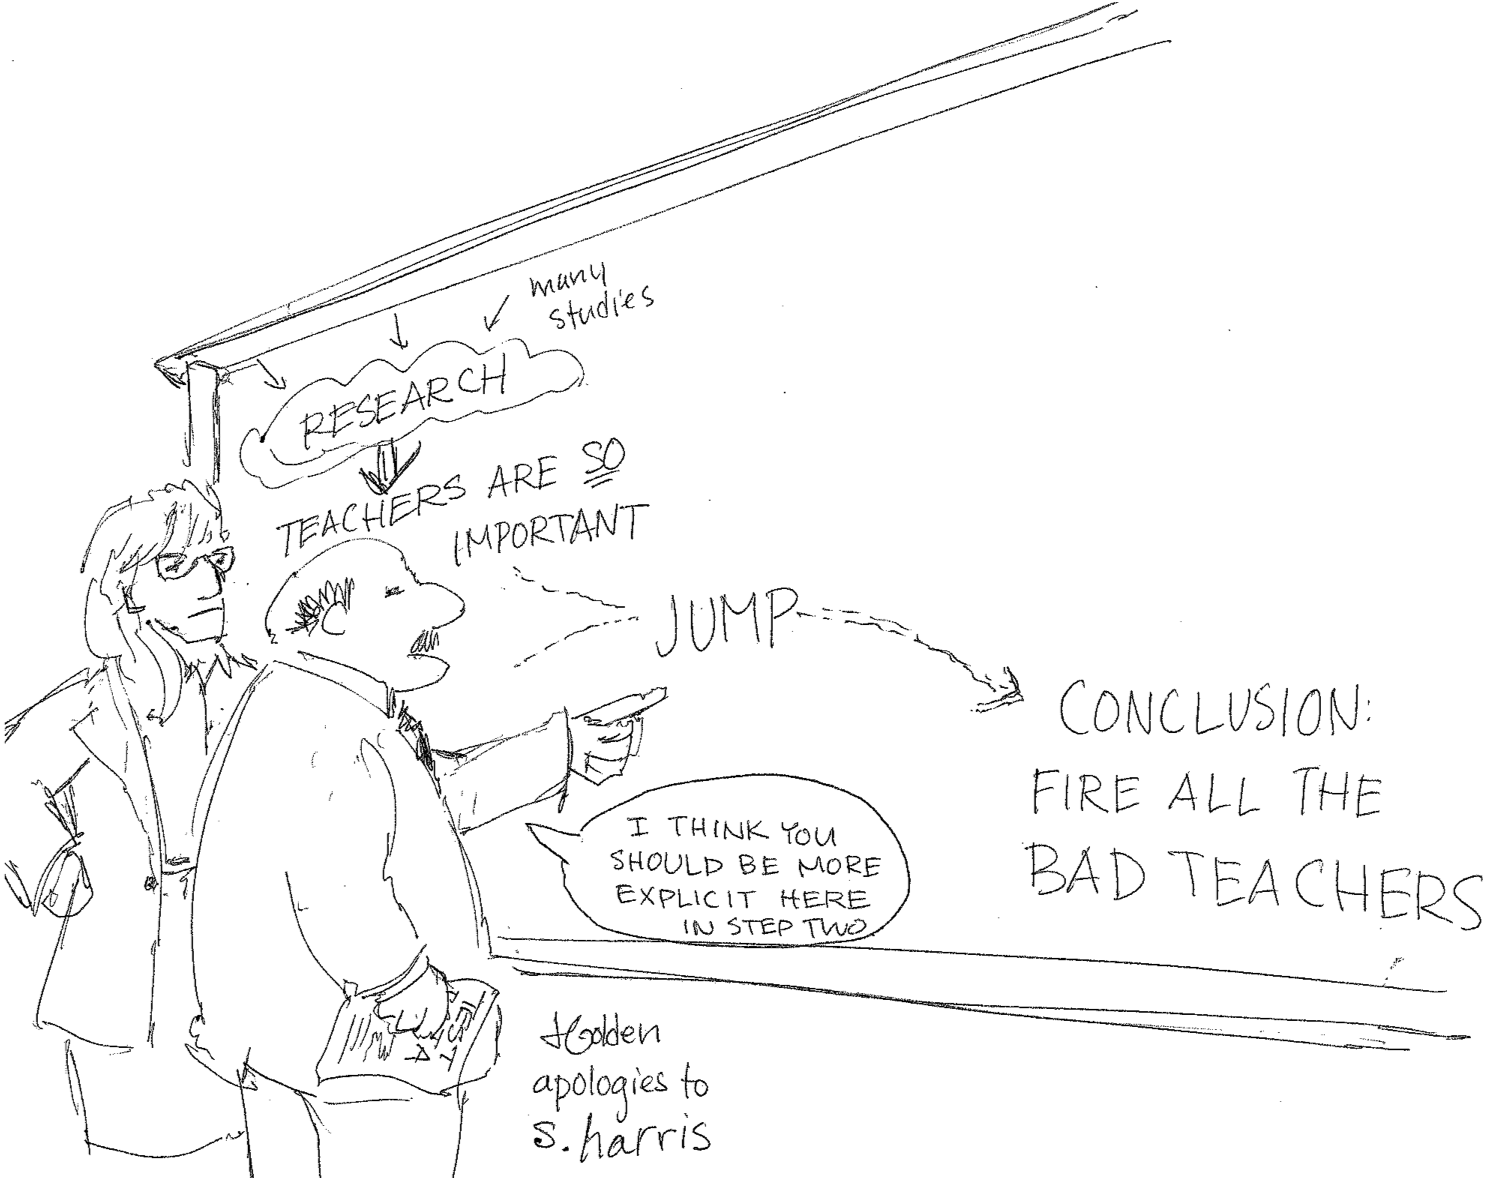 Math Hombre: Teacher Evaluation